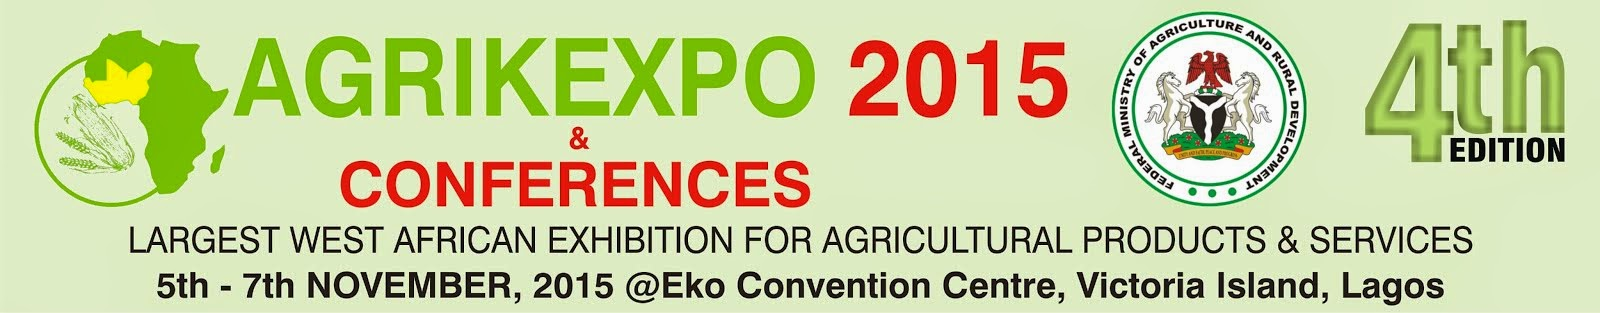 AGRIKEXPO CONFERENCES 2015